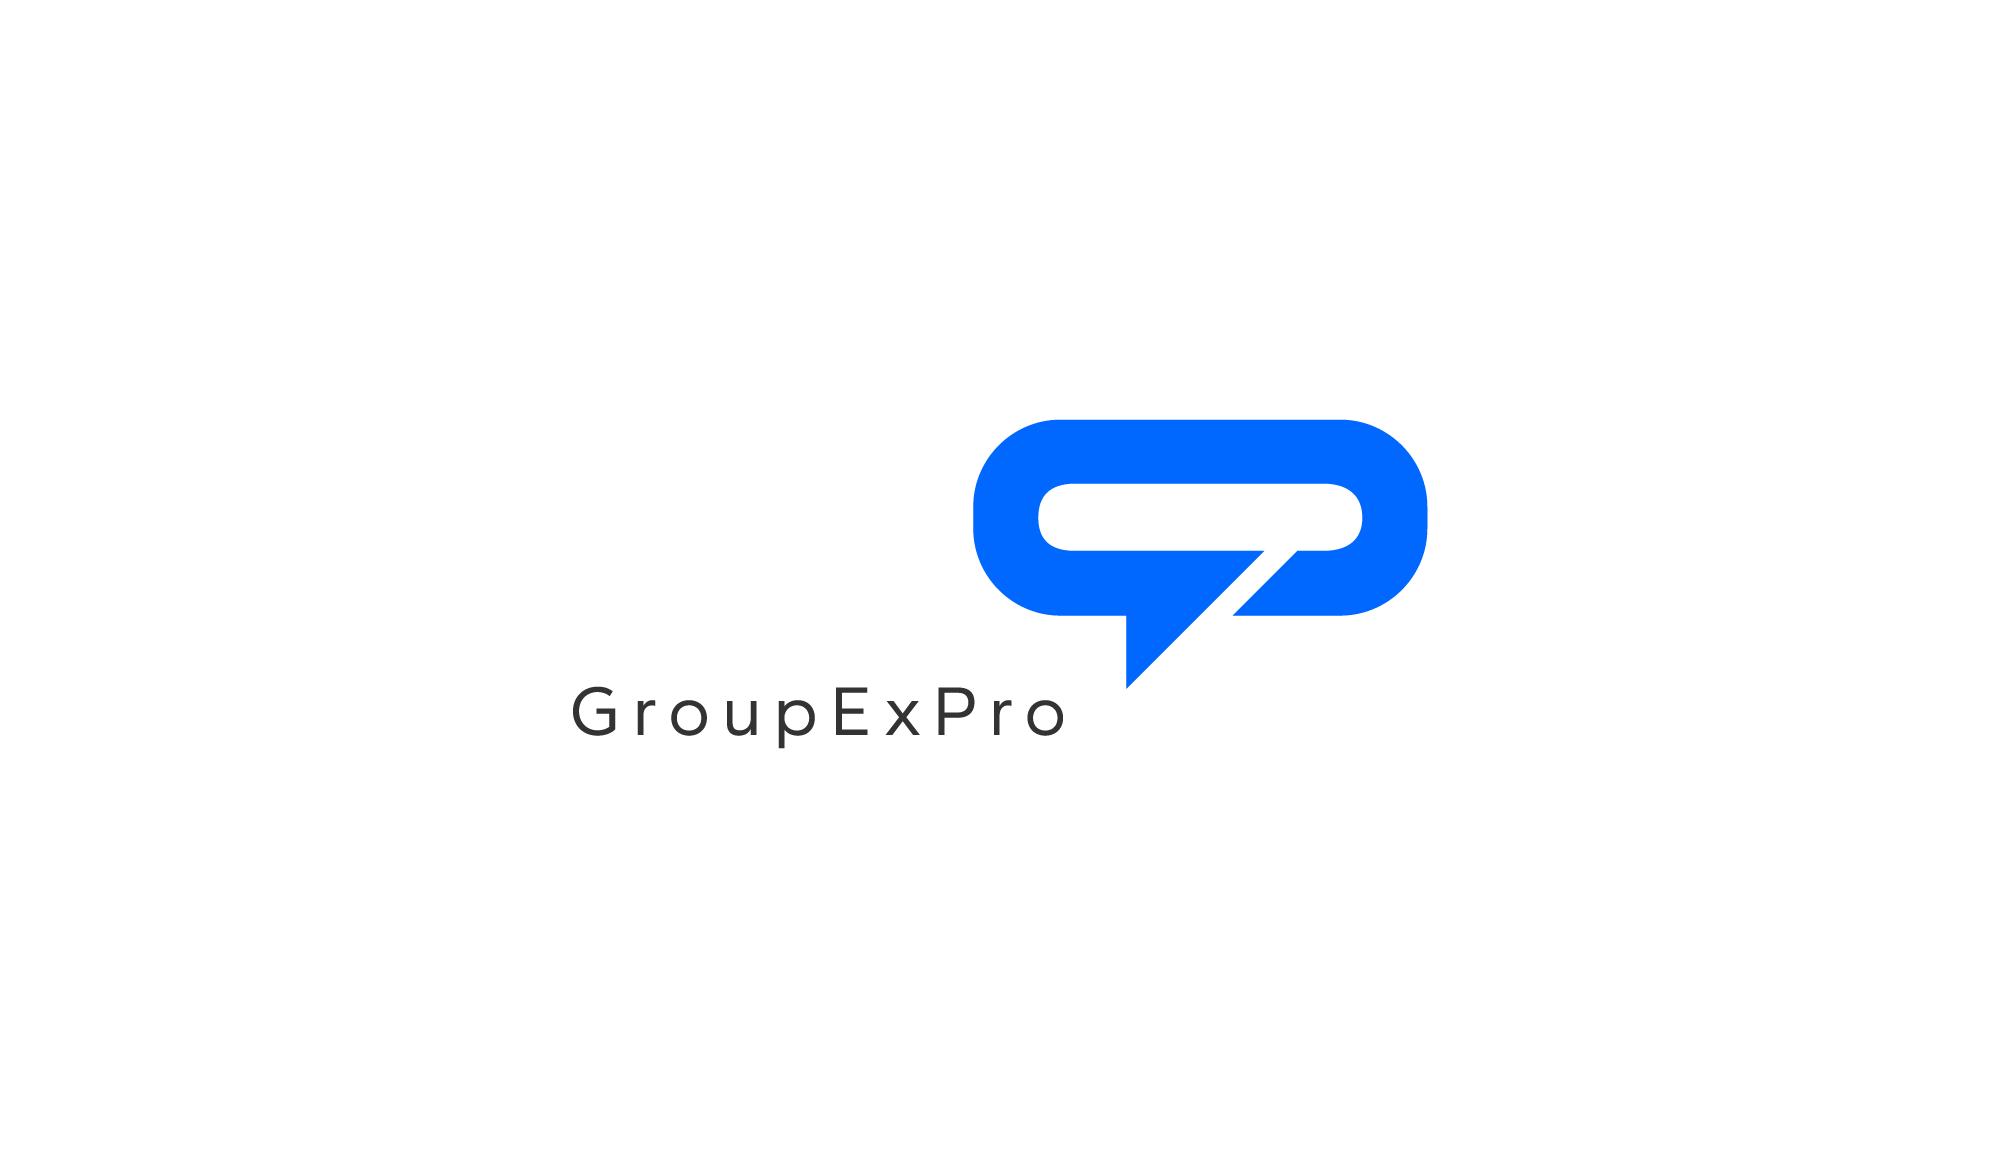 sb-logo-groupexpro-11